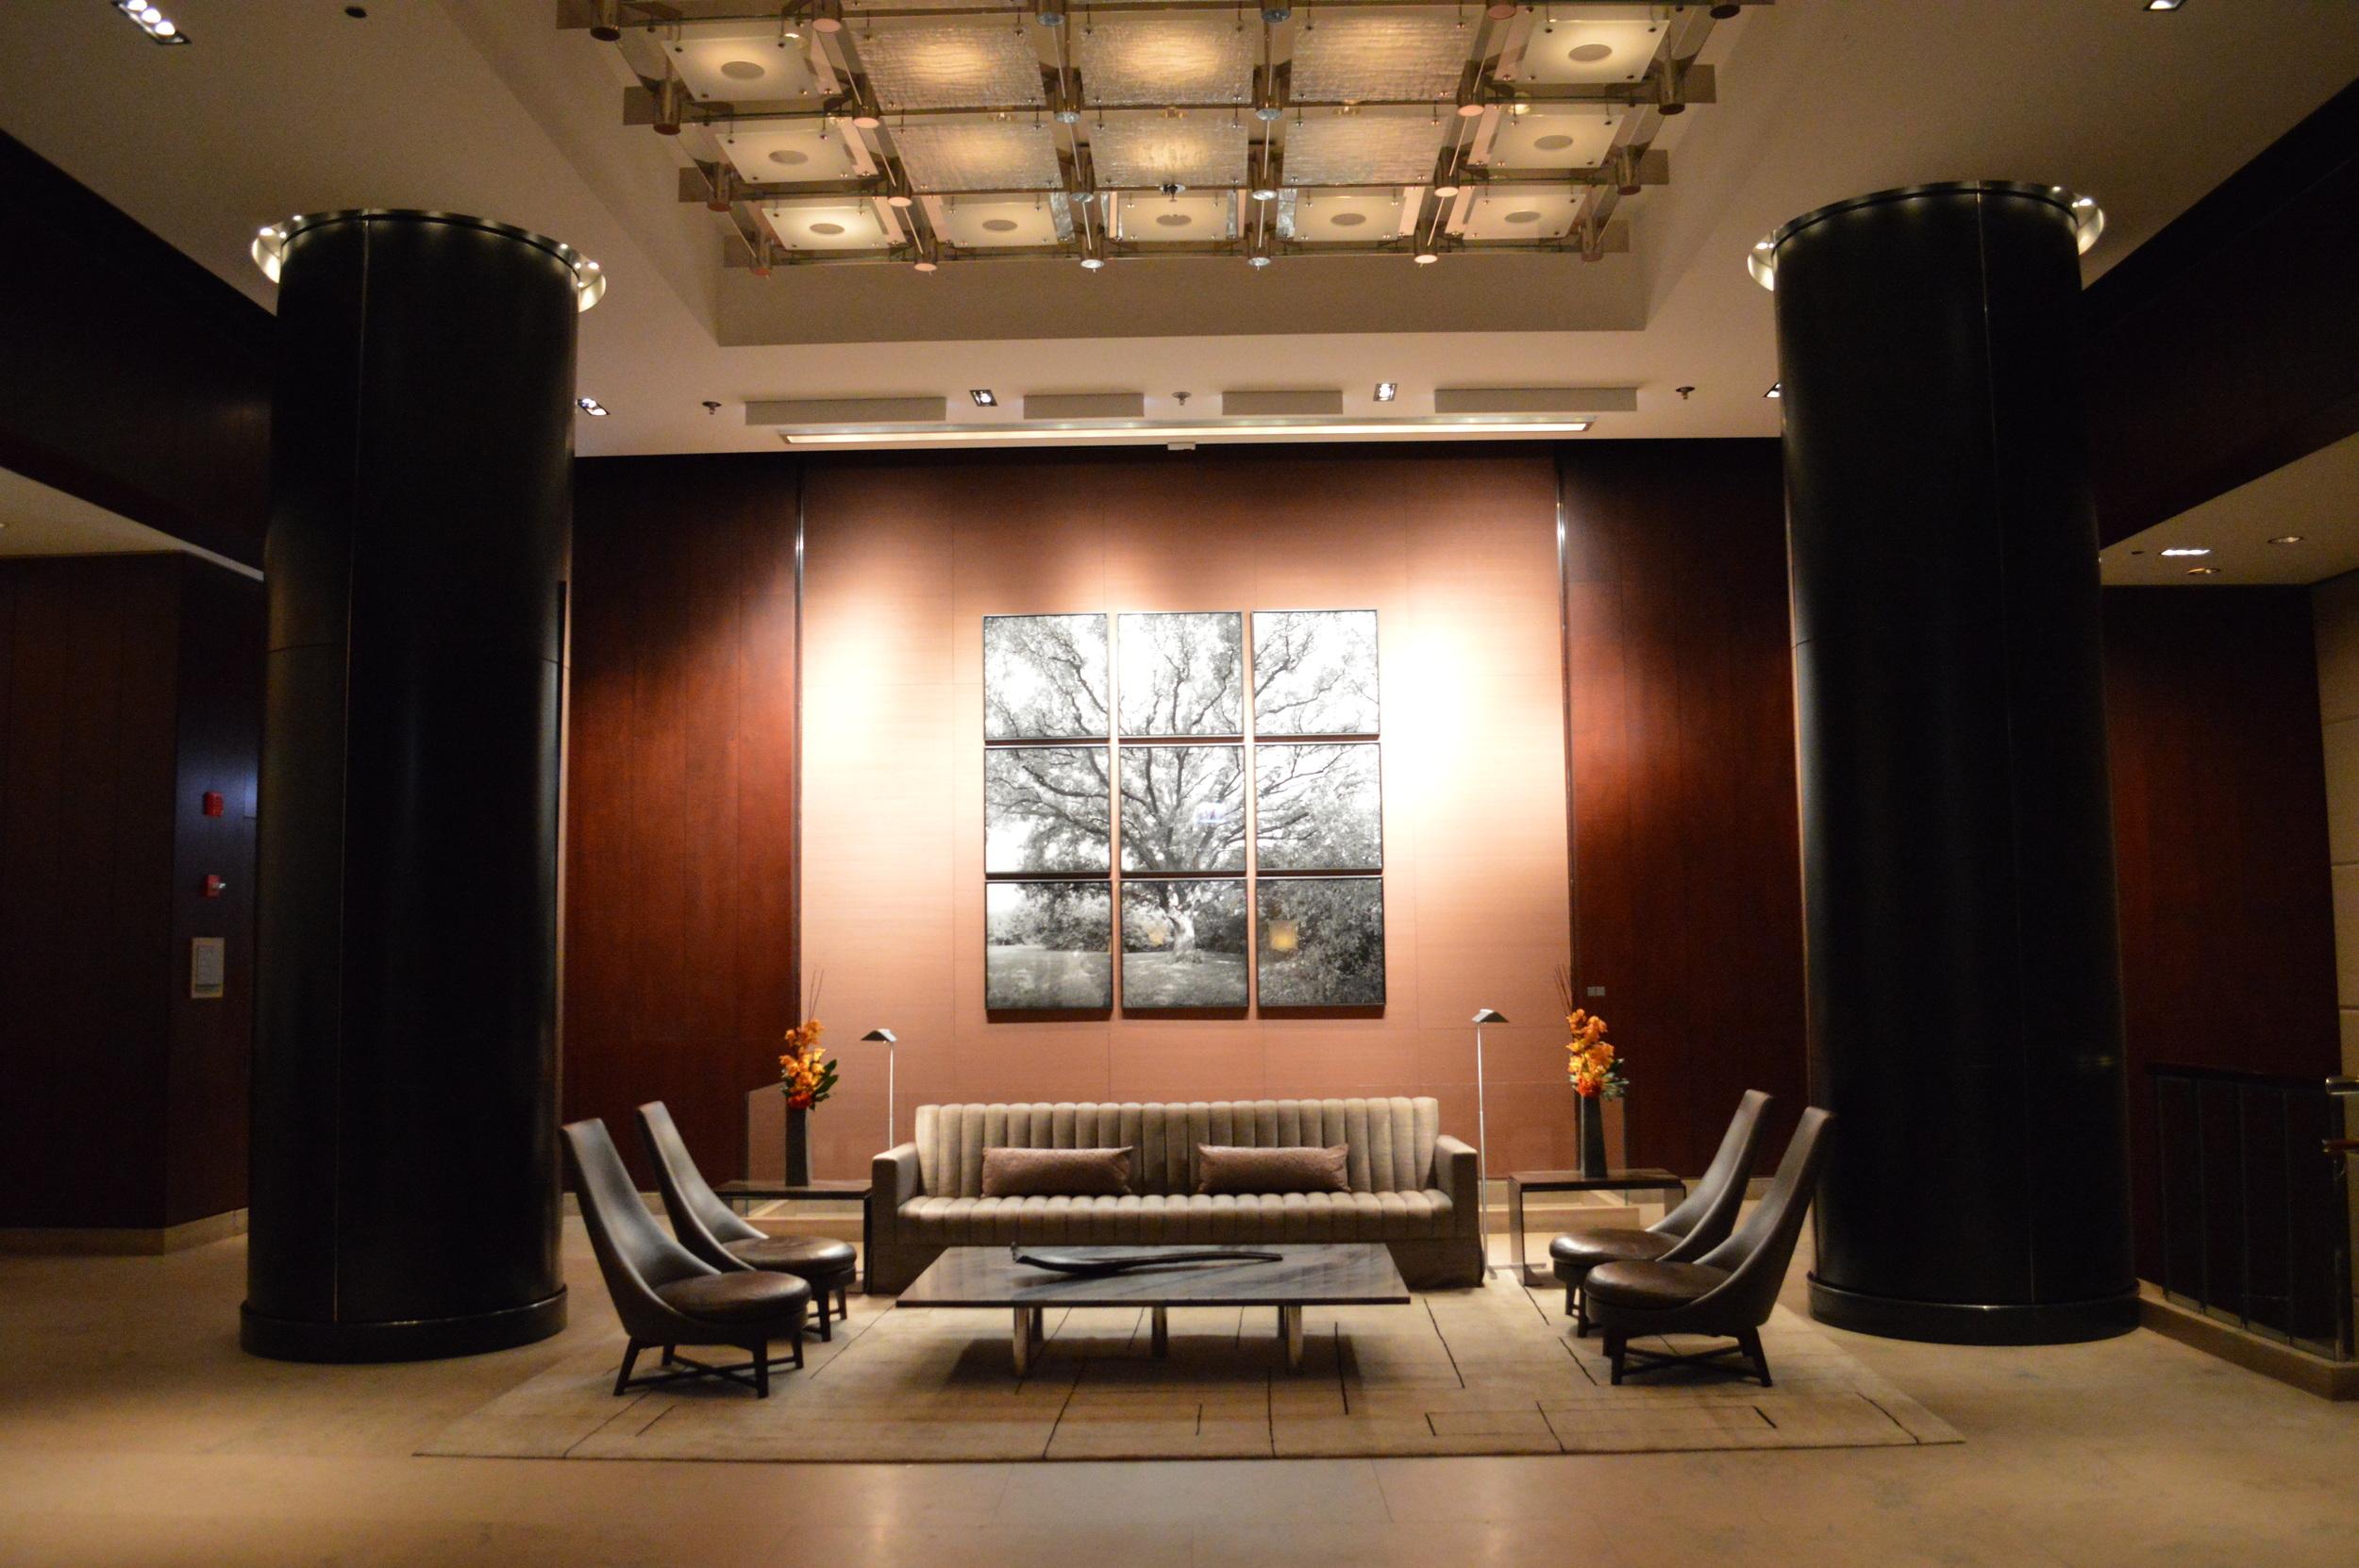 Park Hyatt Hotel Lobby